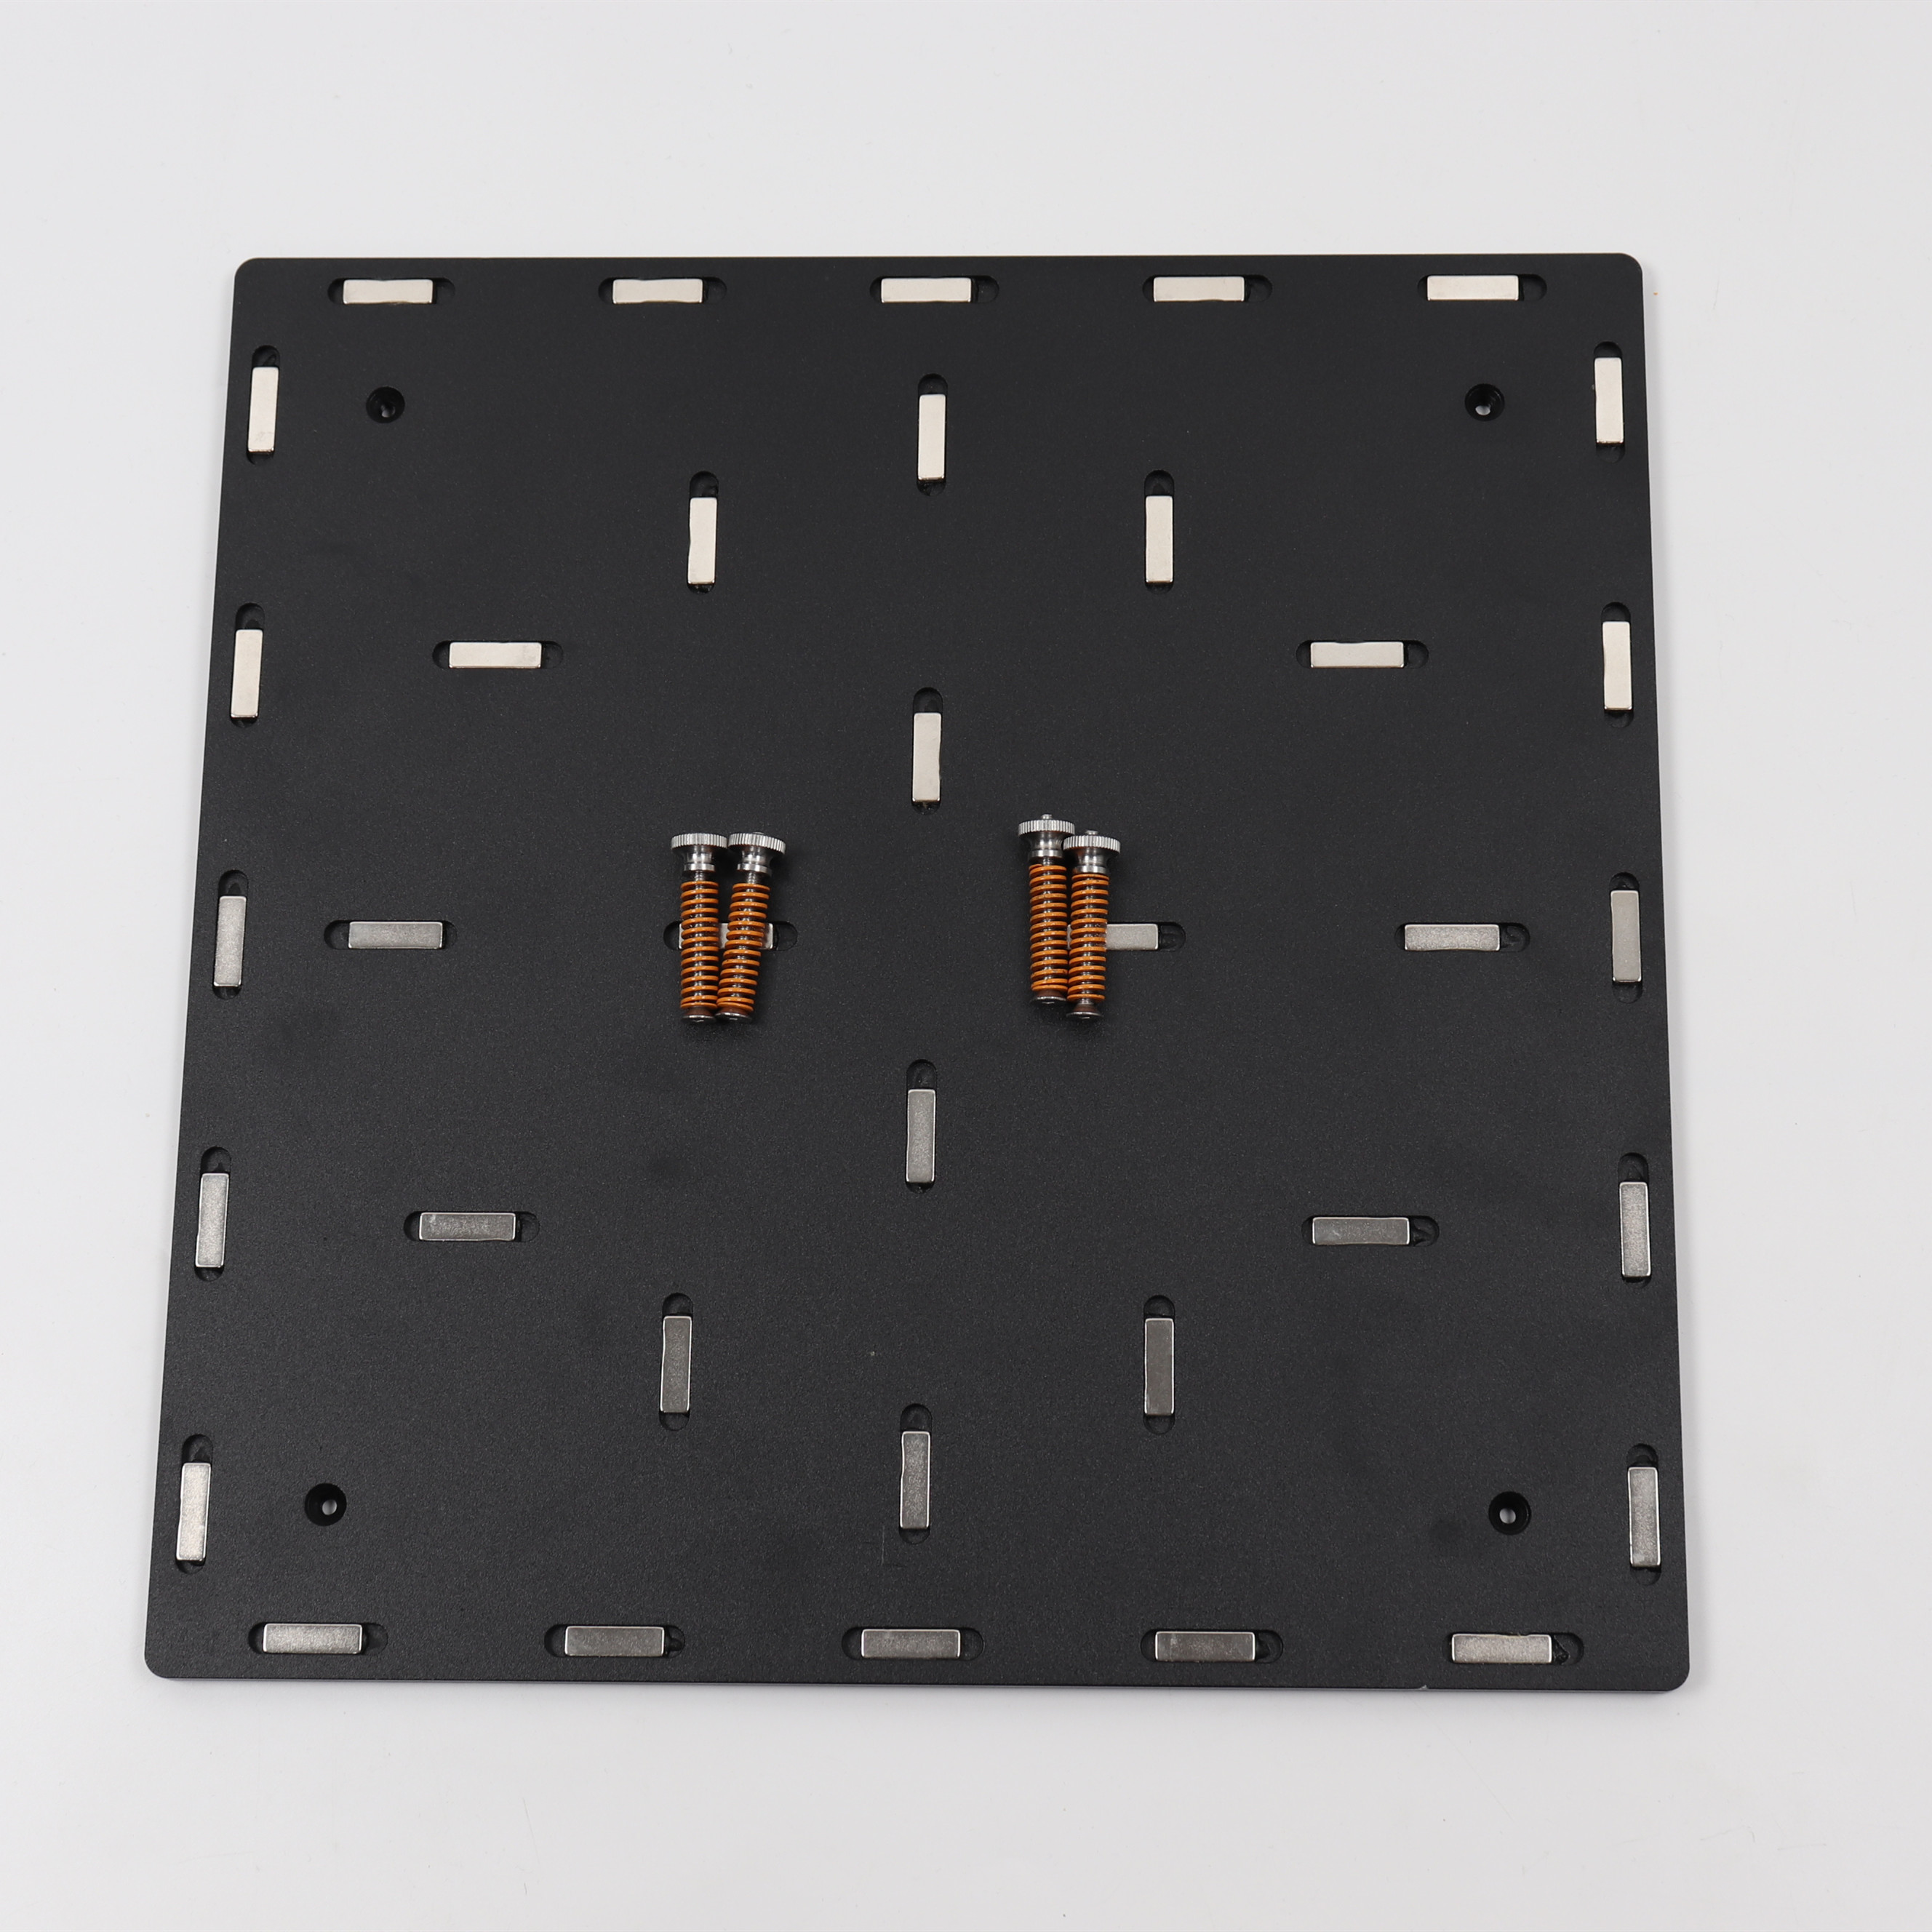 320310mm New Creality 3D Ultrabase 3D Printer Platform Heated Bed Build Surfa...